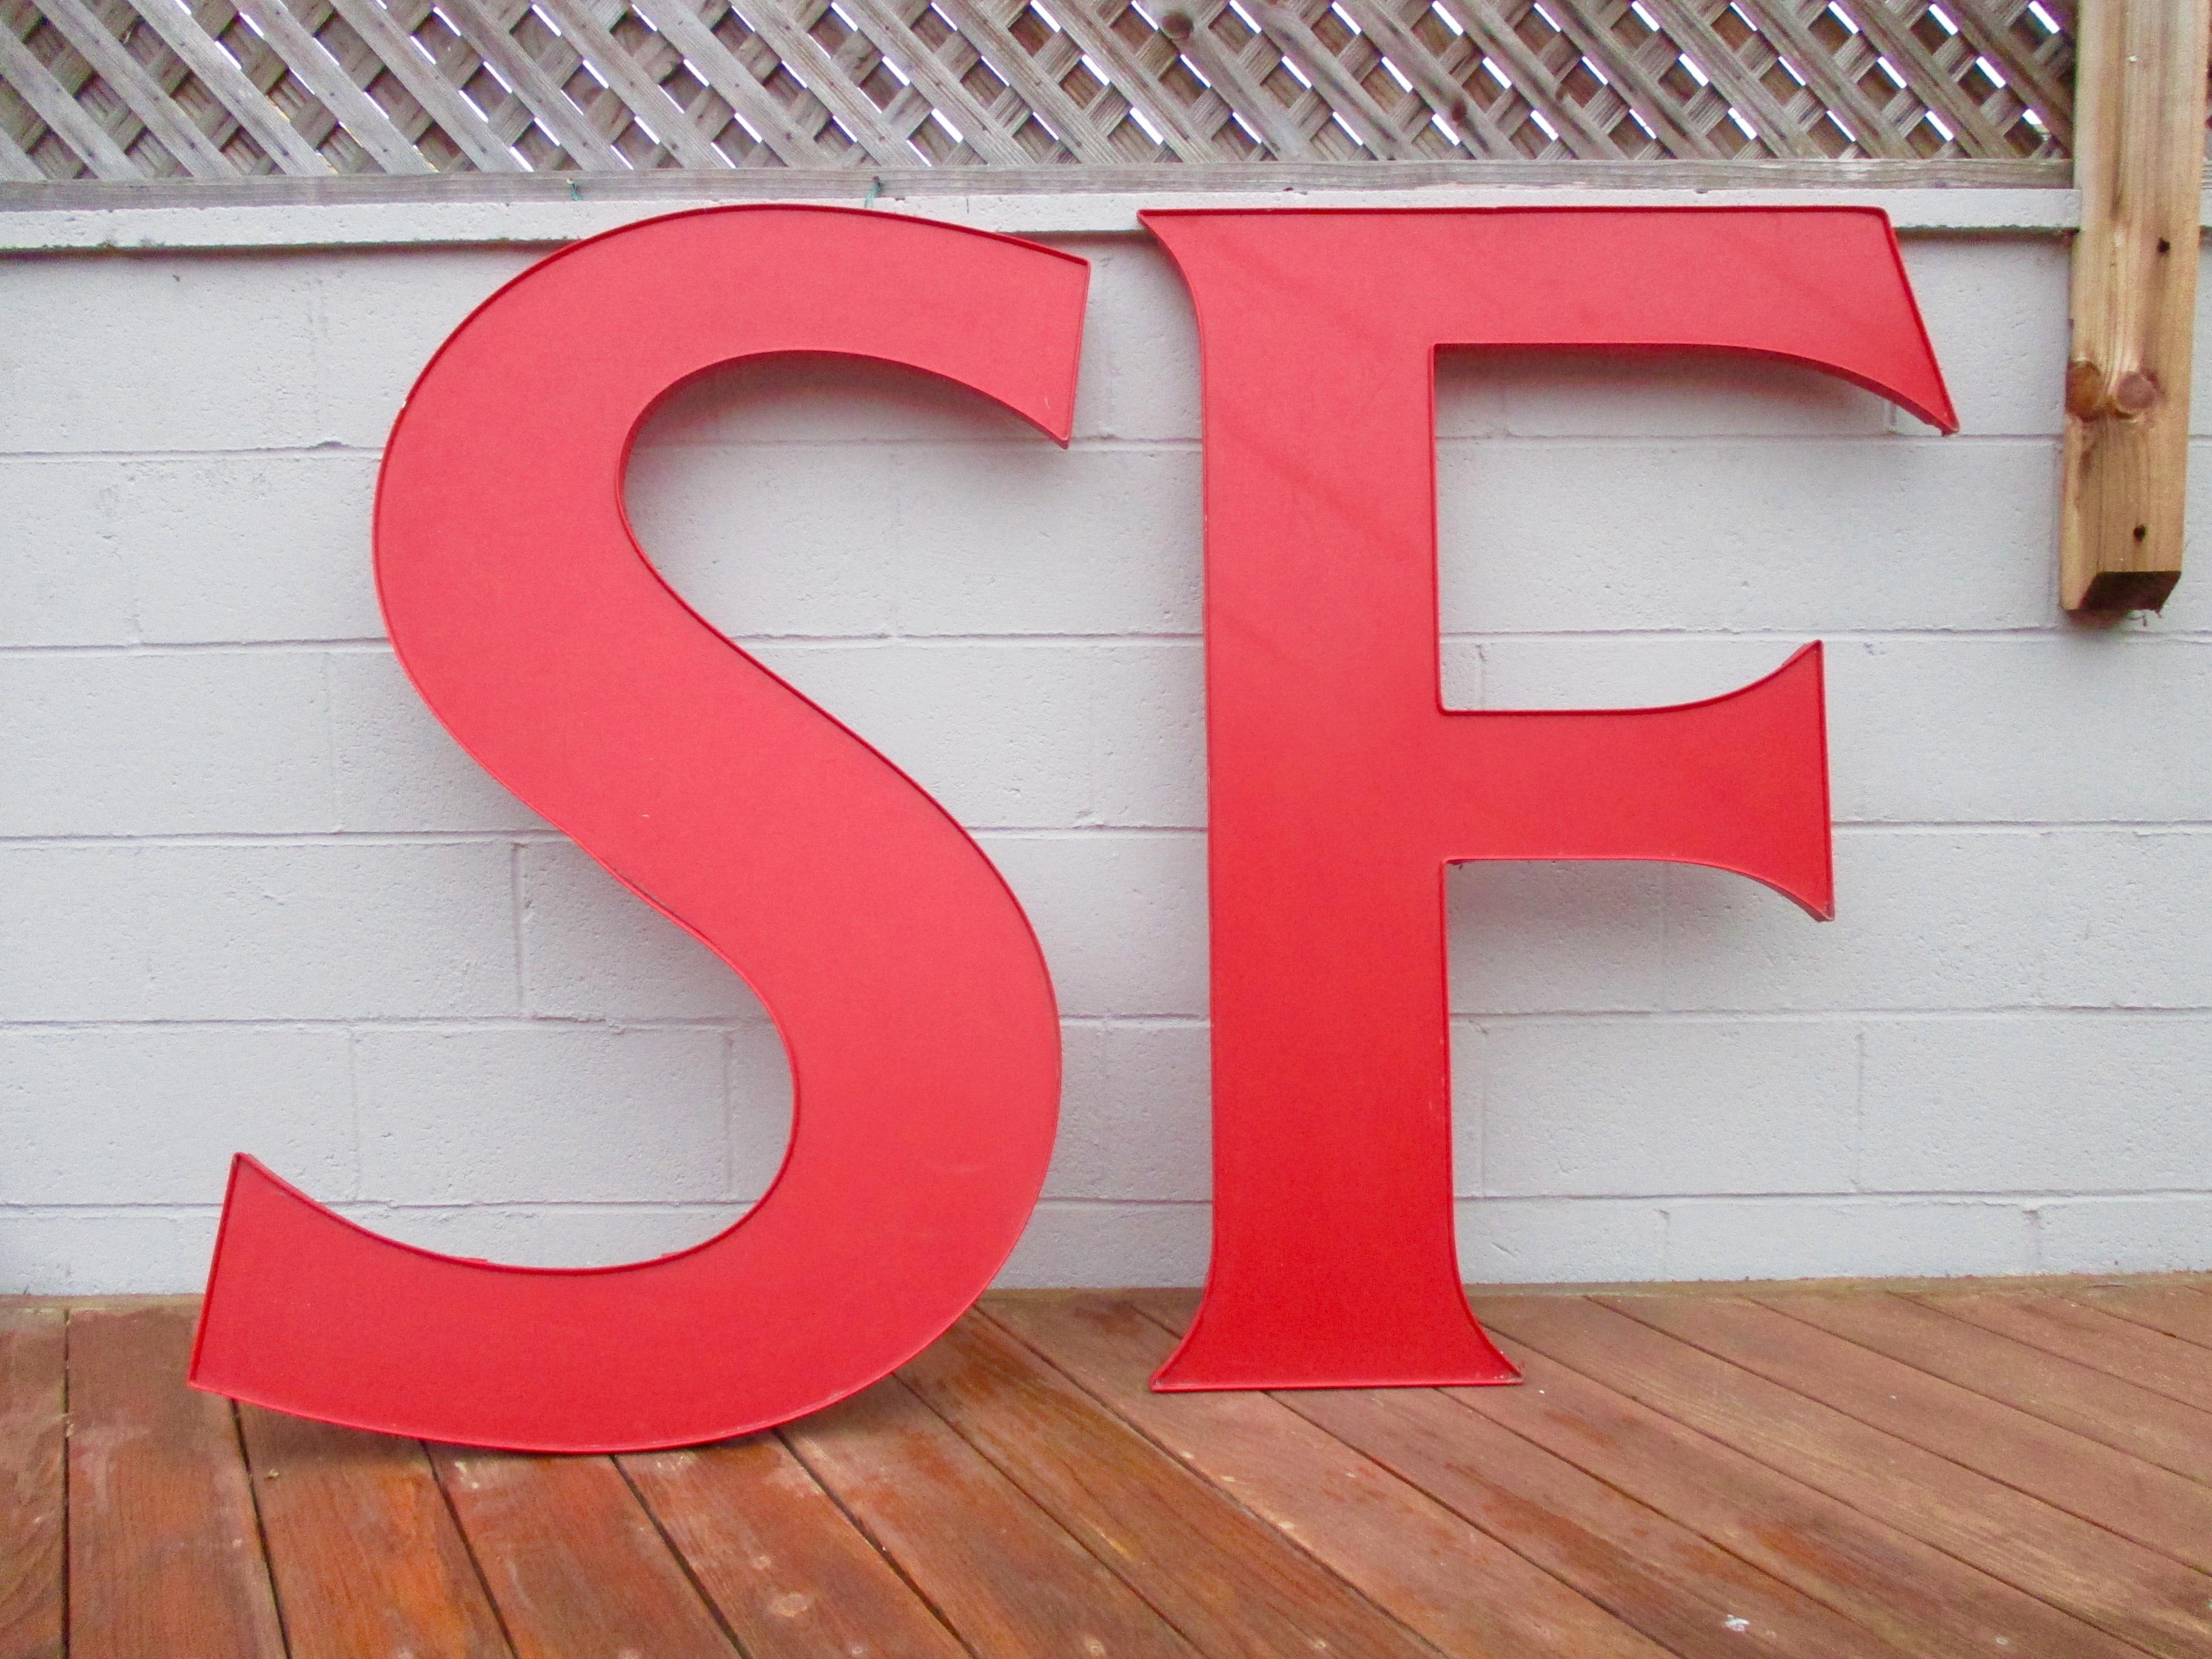 S F San Francisco California Pop Art Prop   S/2 Sign Letters   Image 2